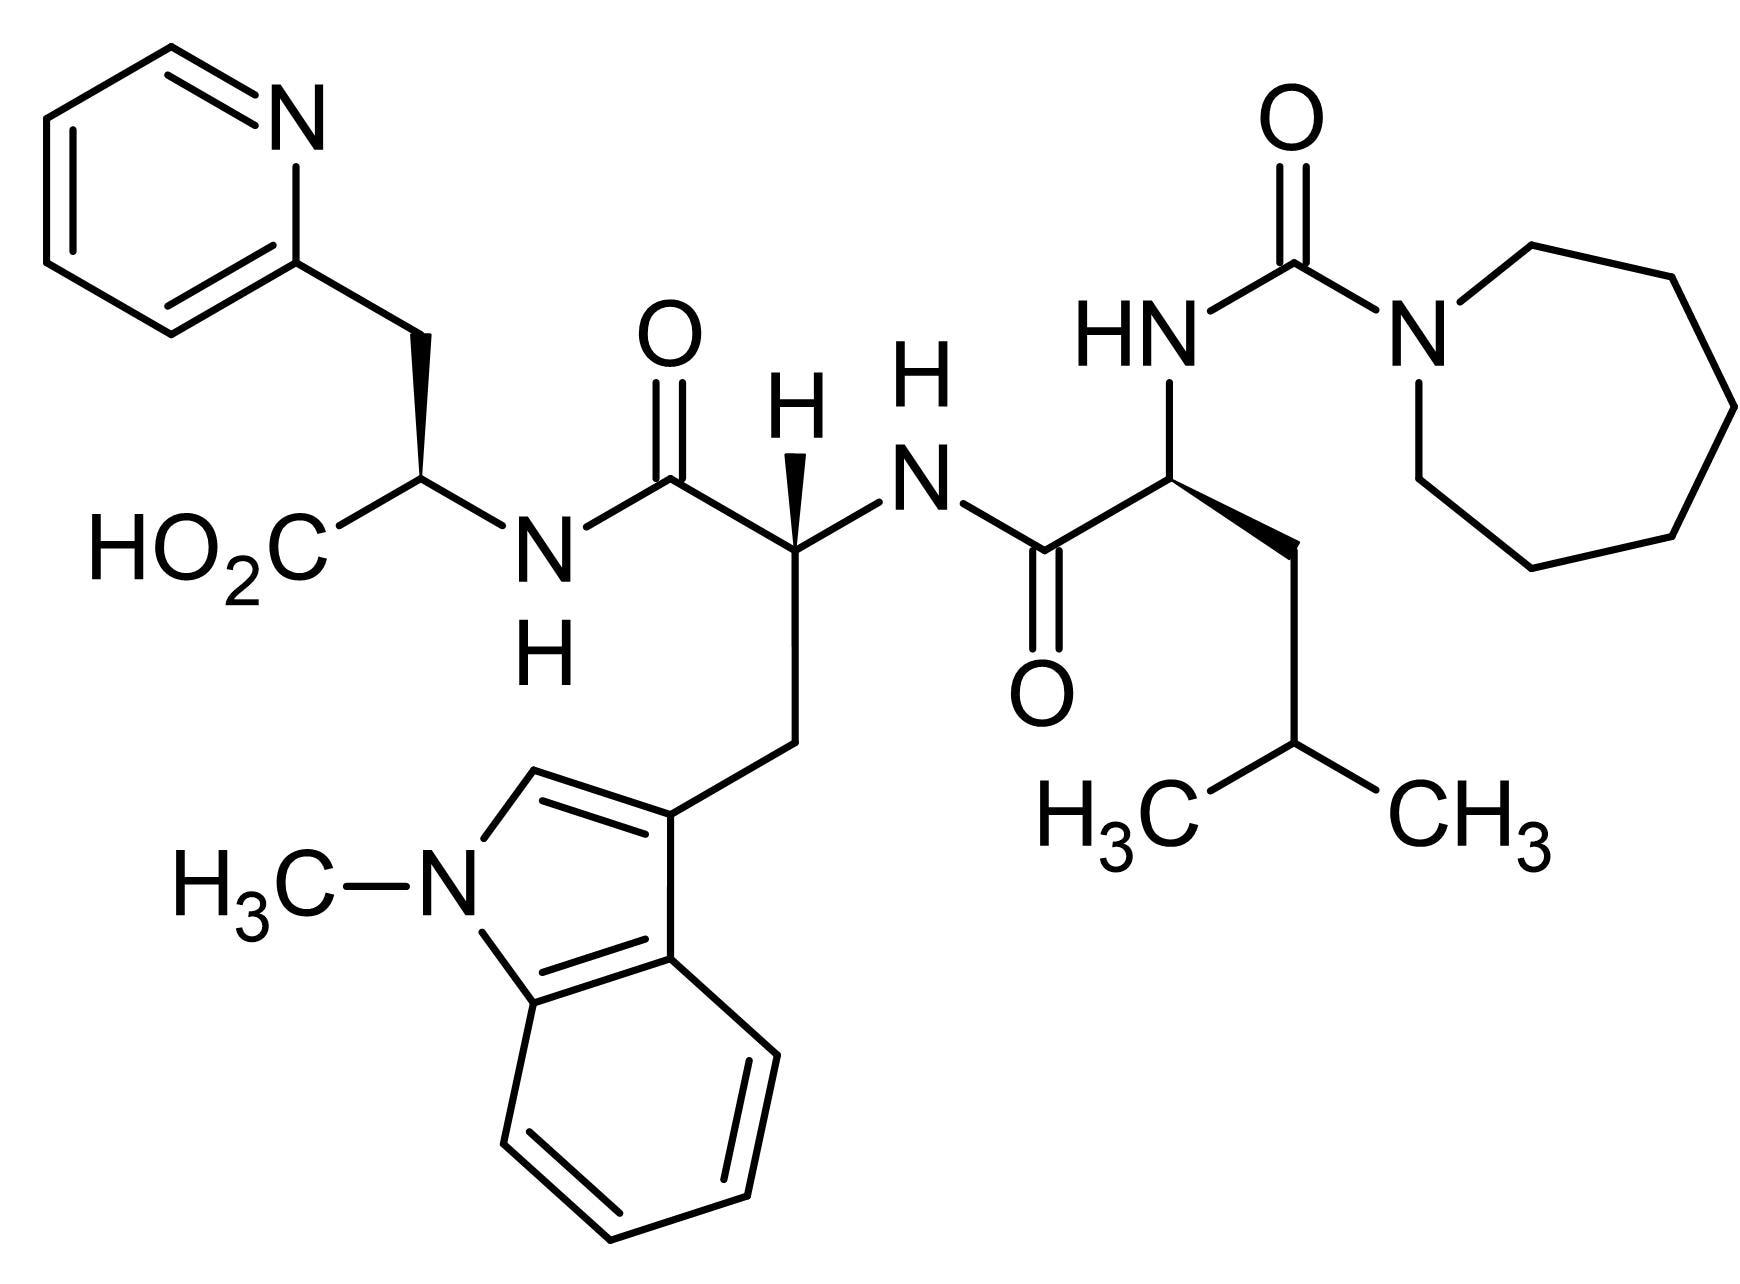 Chemical Structure - FR 139317, ET<sub>A</sub> receptor antagonist (ab144636)